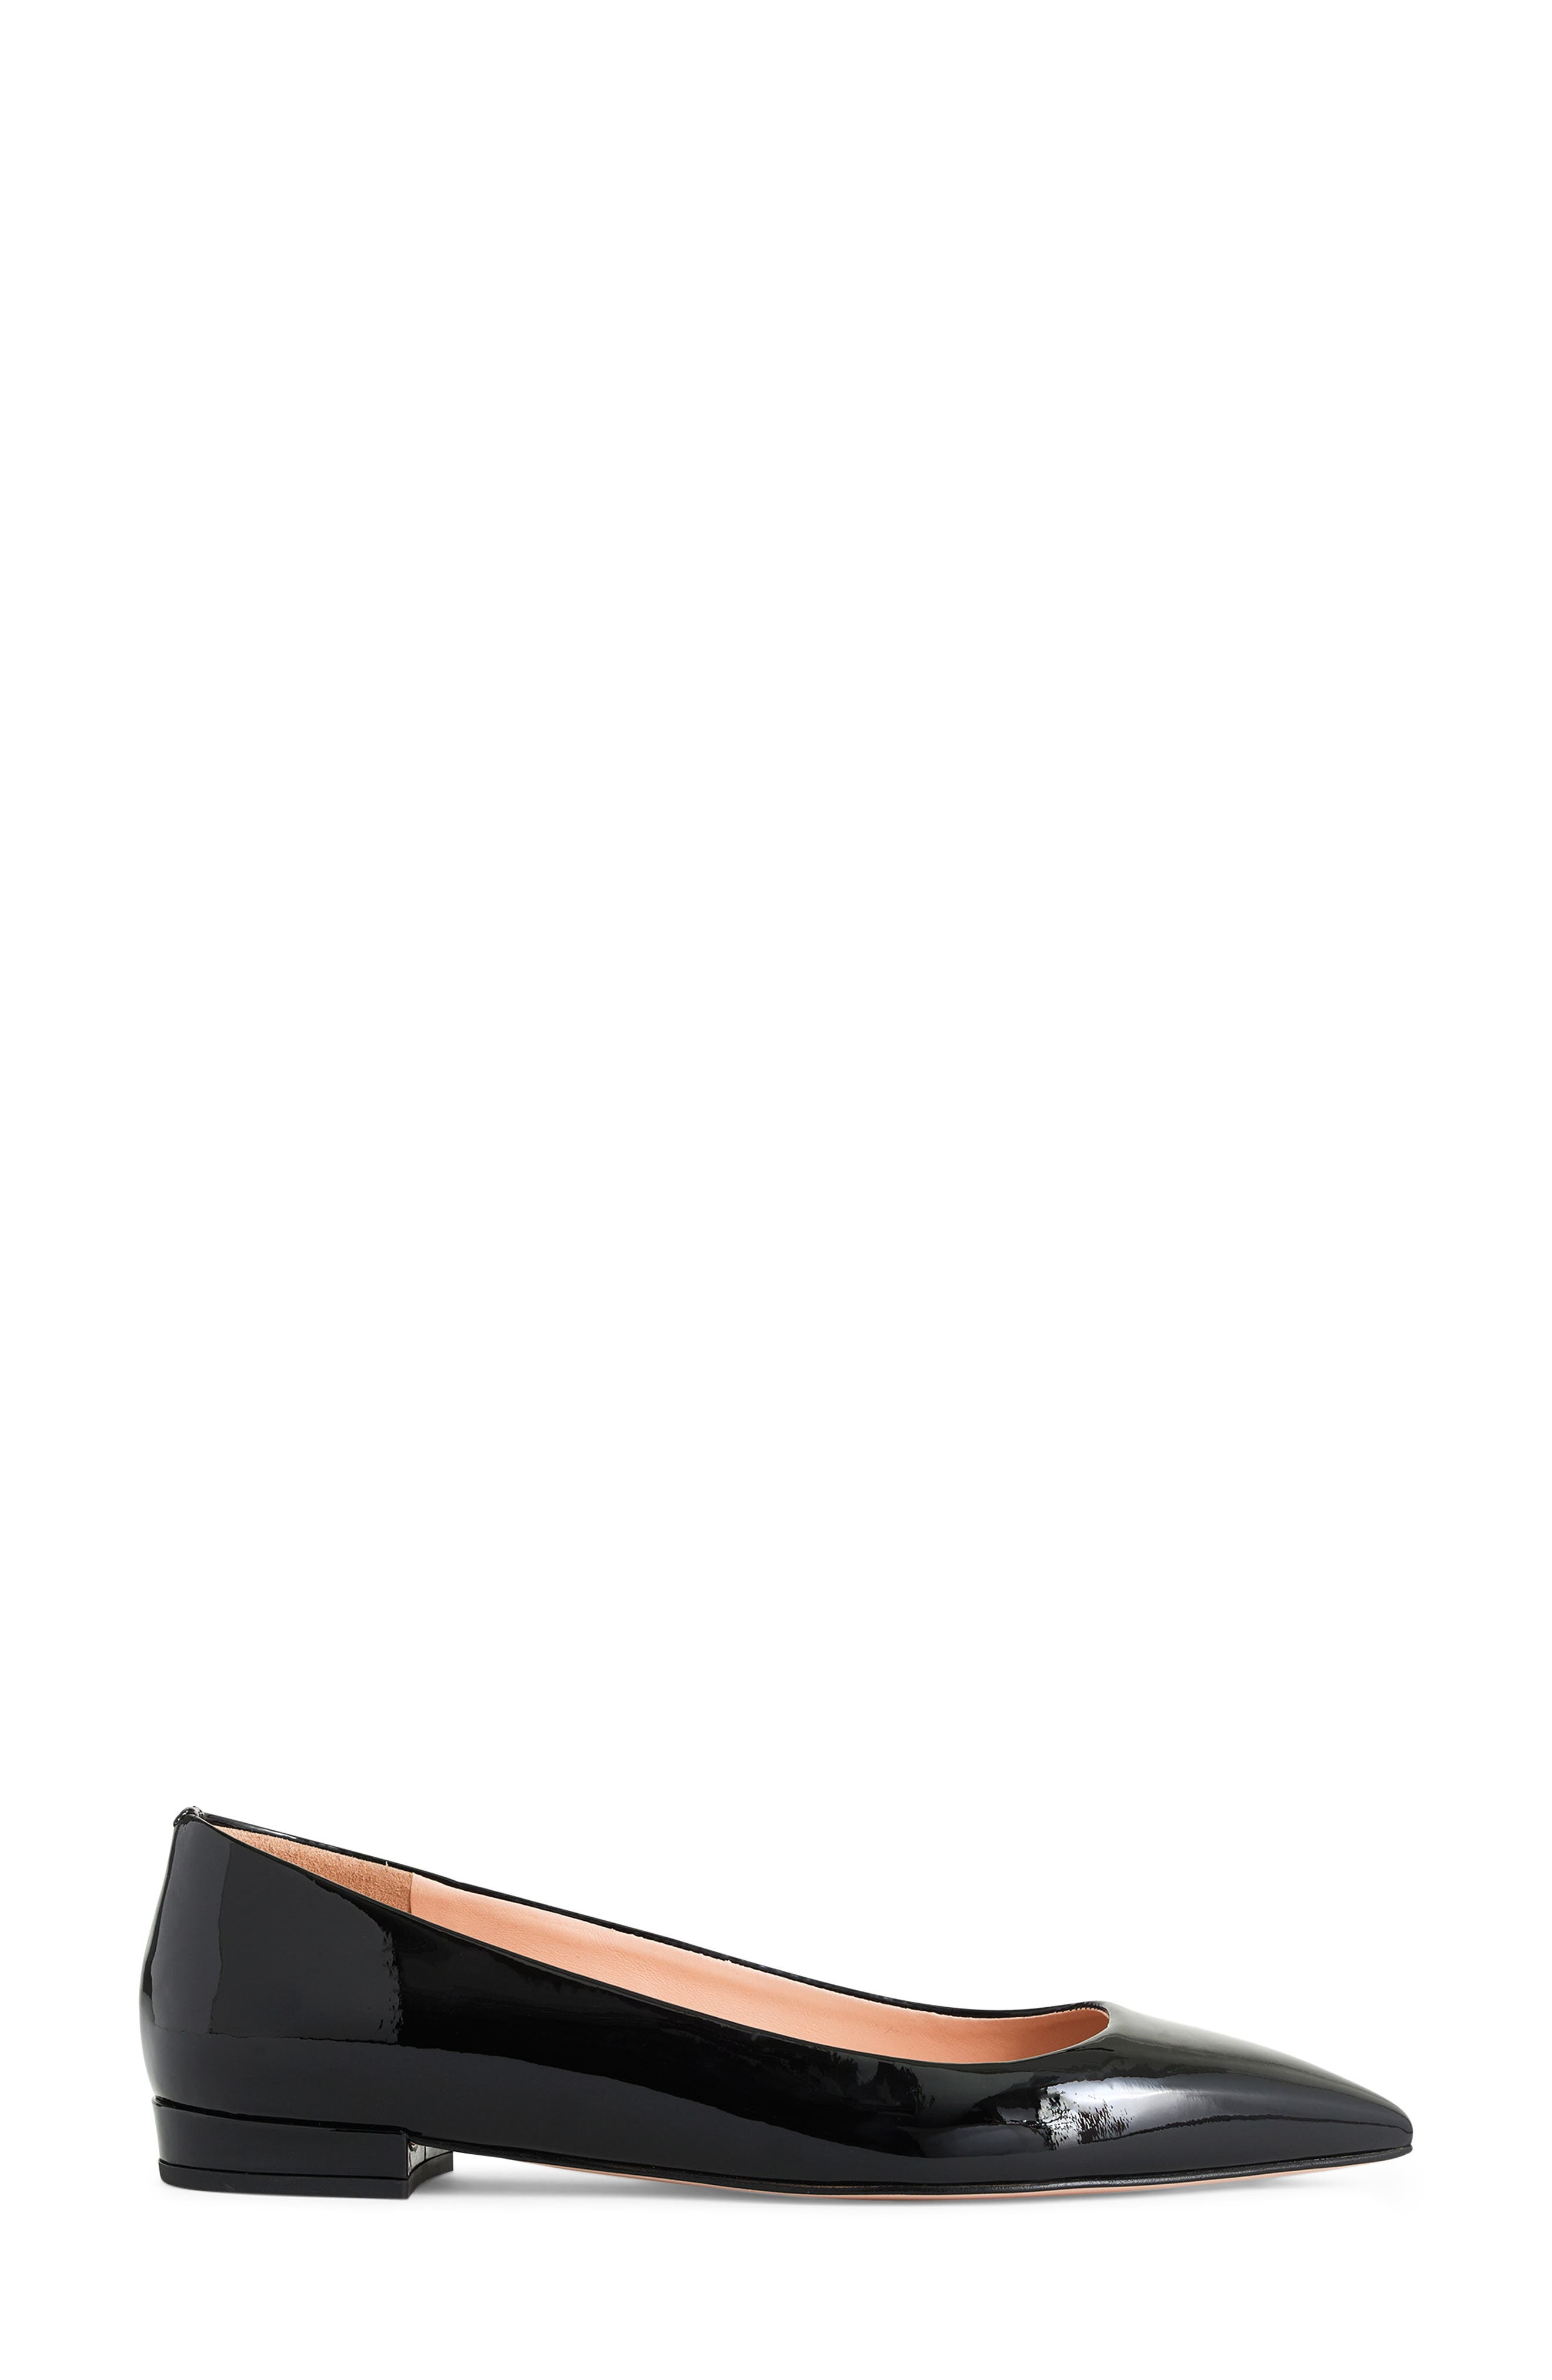 J.CREW, Pointed Toe Flat, Alternate thumbnail 2, color, BLACK PATENT LEATHER